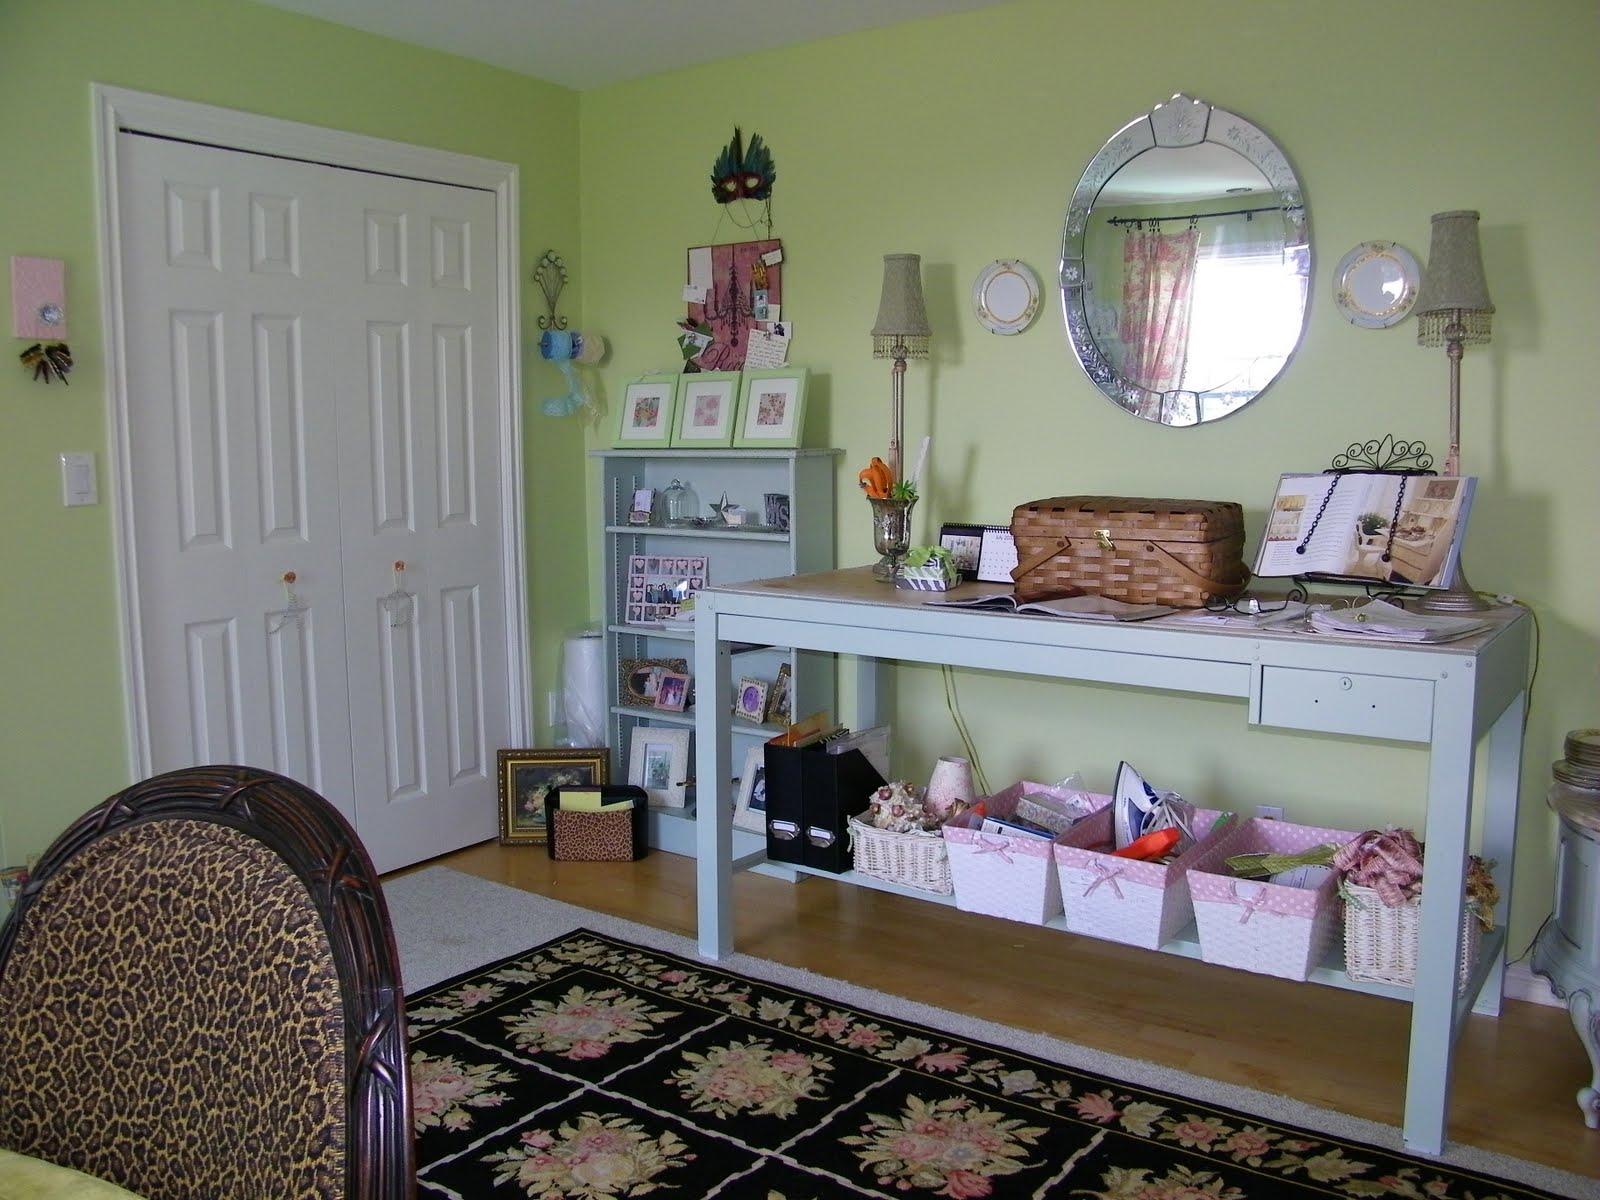 maison decor marie antoinette meets maison decor in new home office. Black Bedroom Furniture Sets. Home Design Ideas